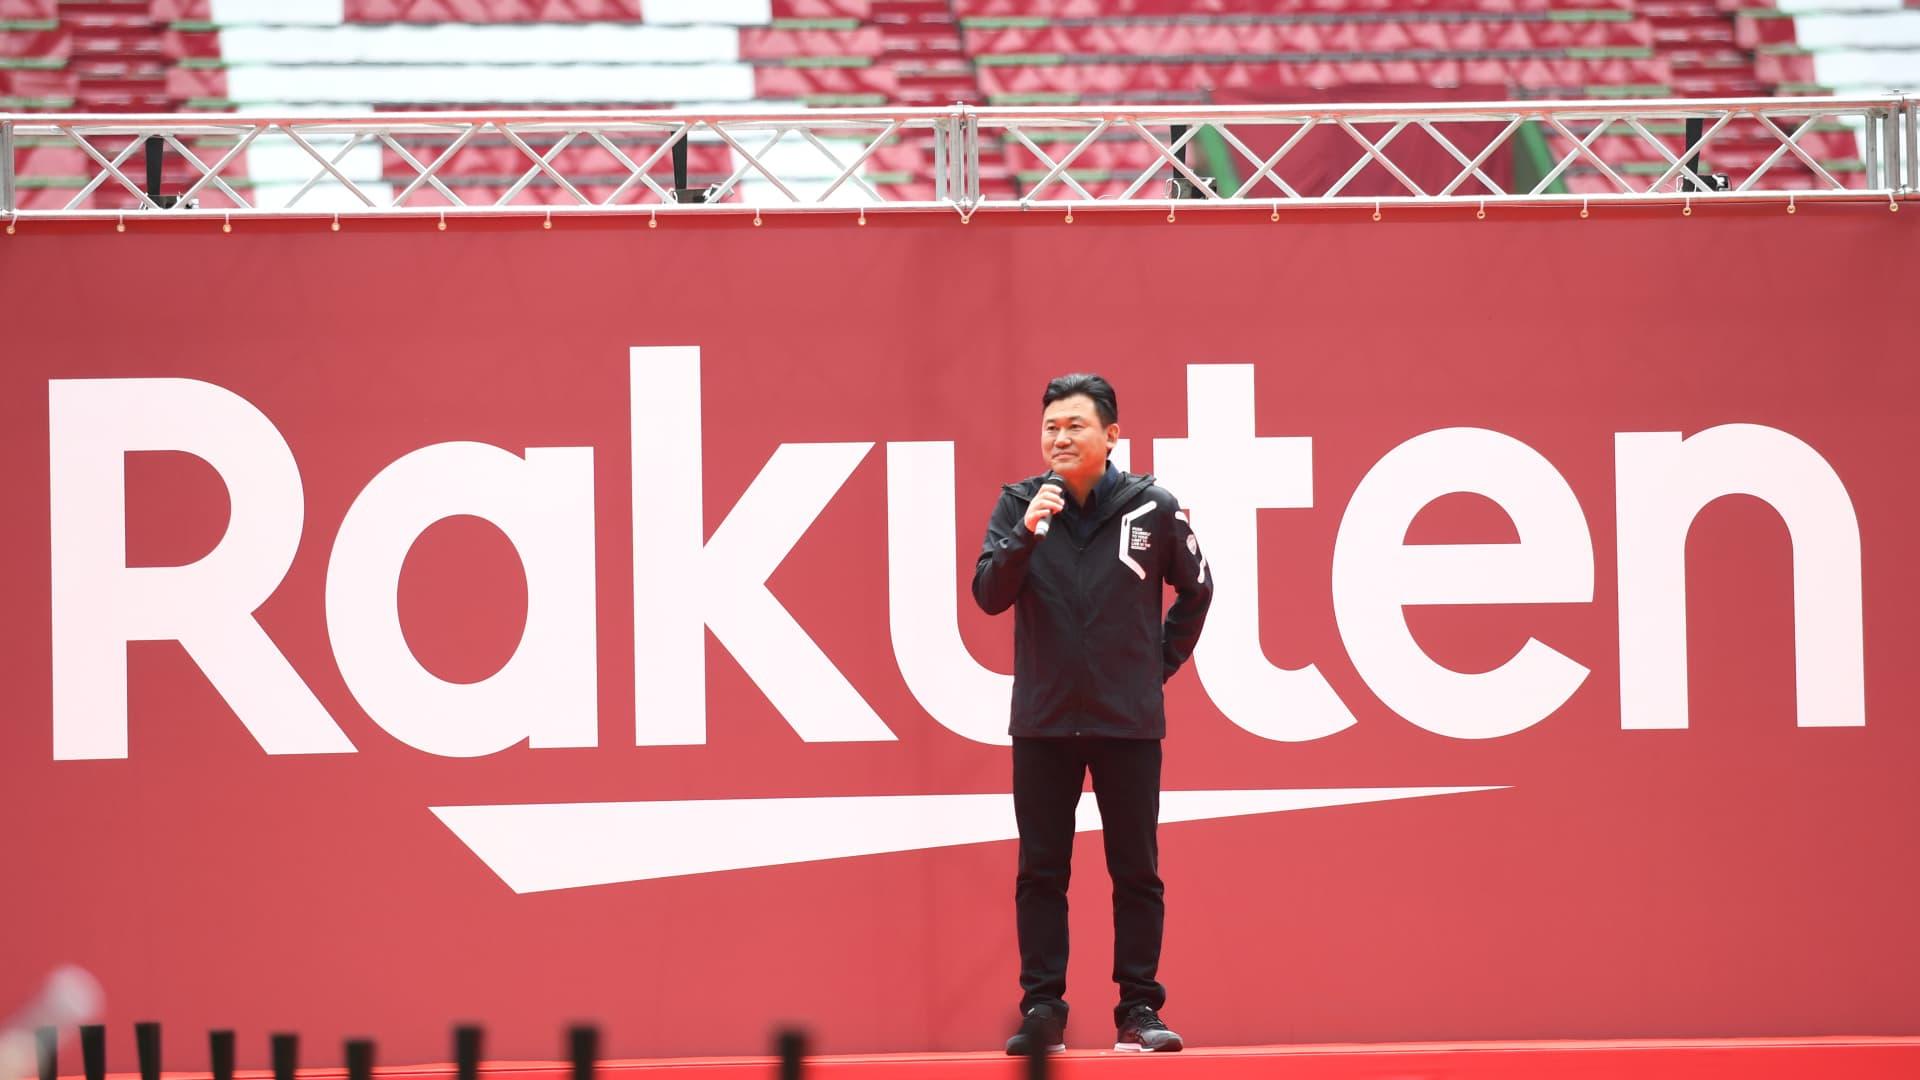 Rakuten vs  Amazon: The battle for Japan's e-commerce market